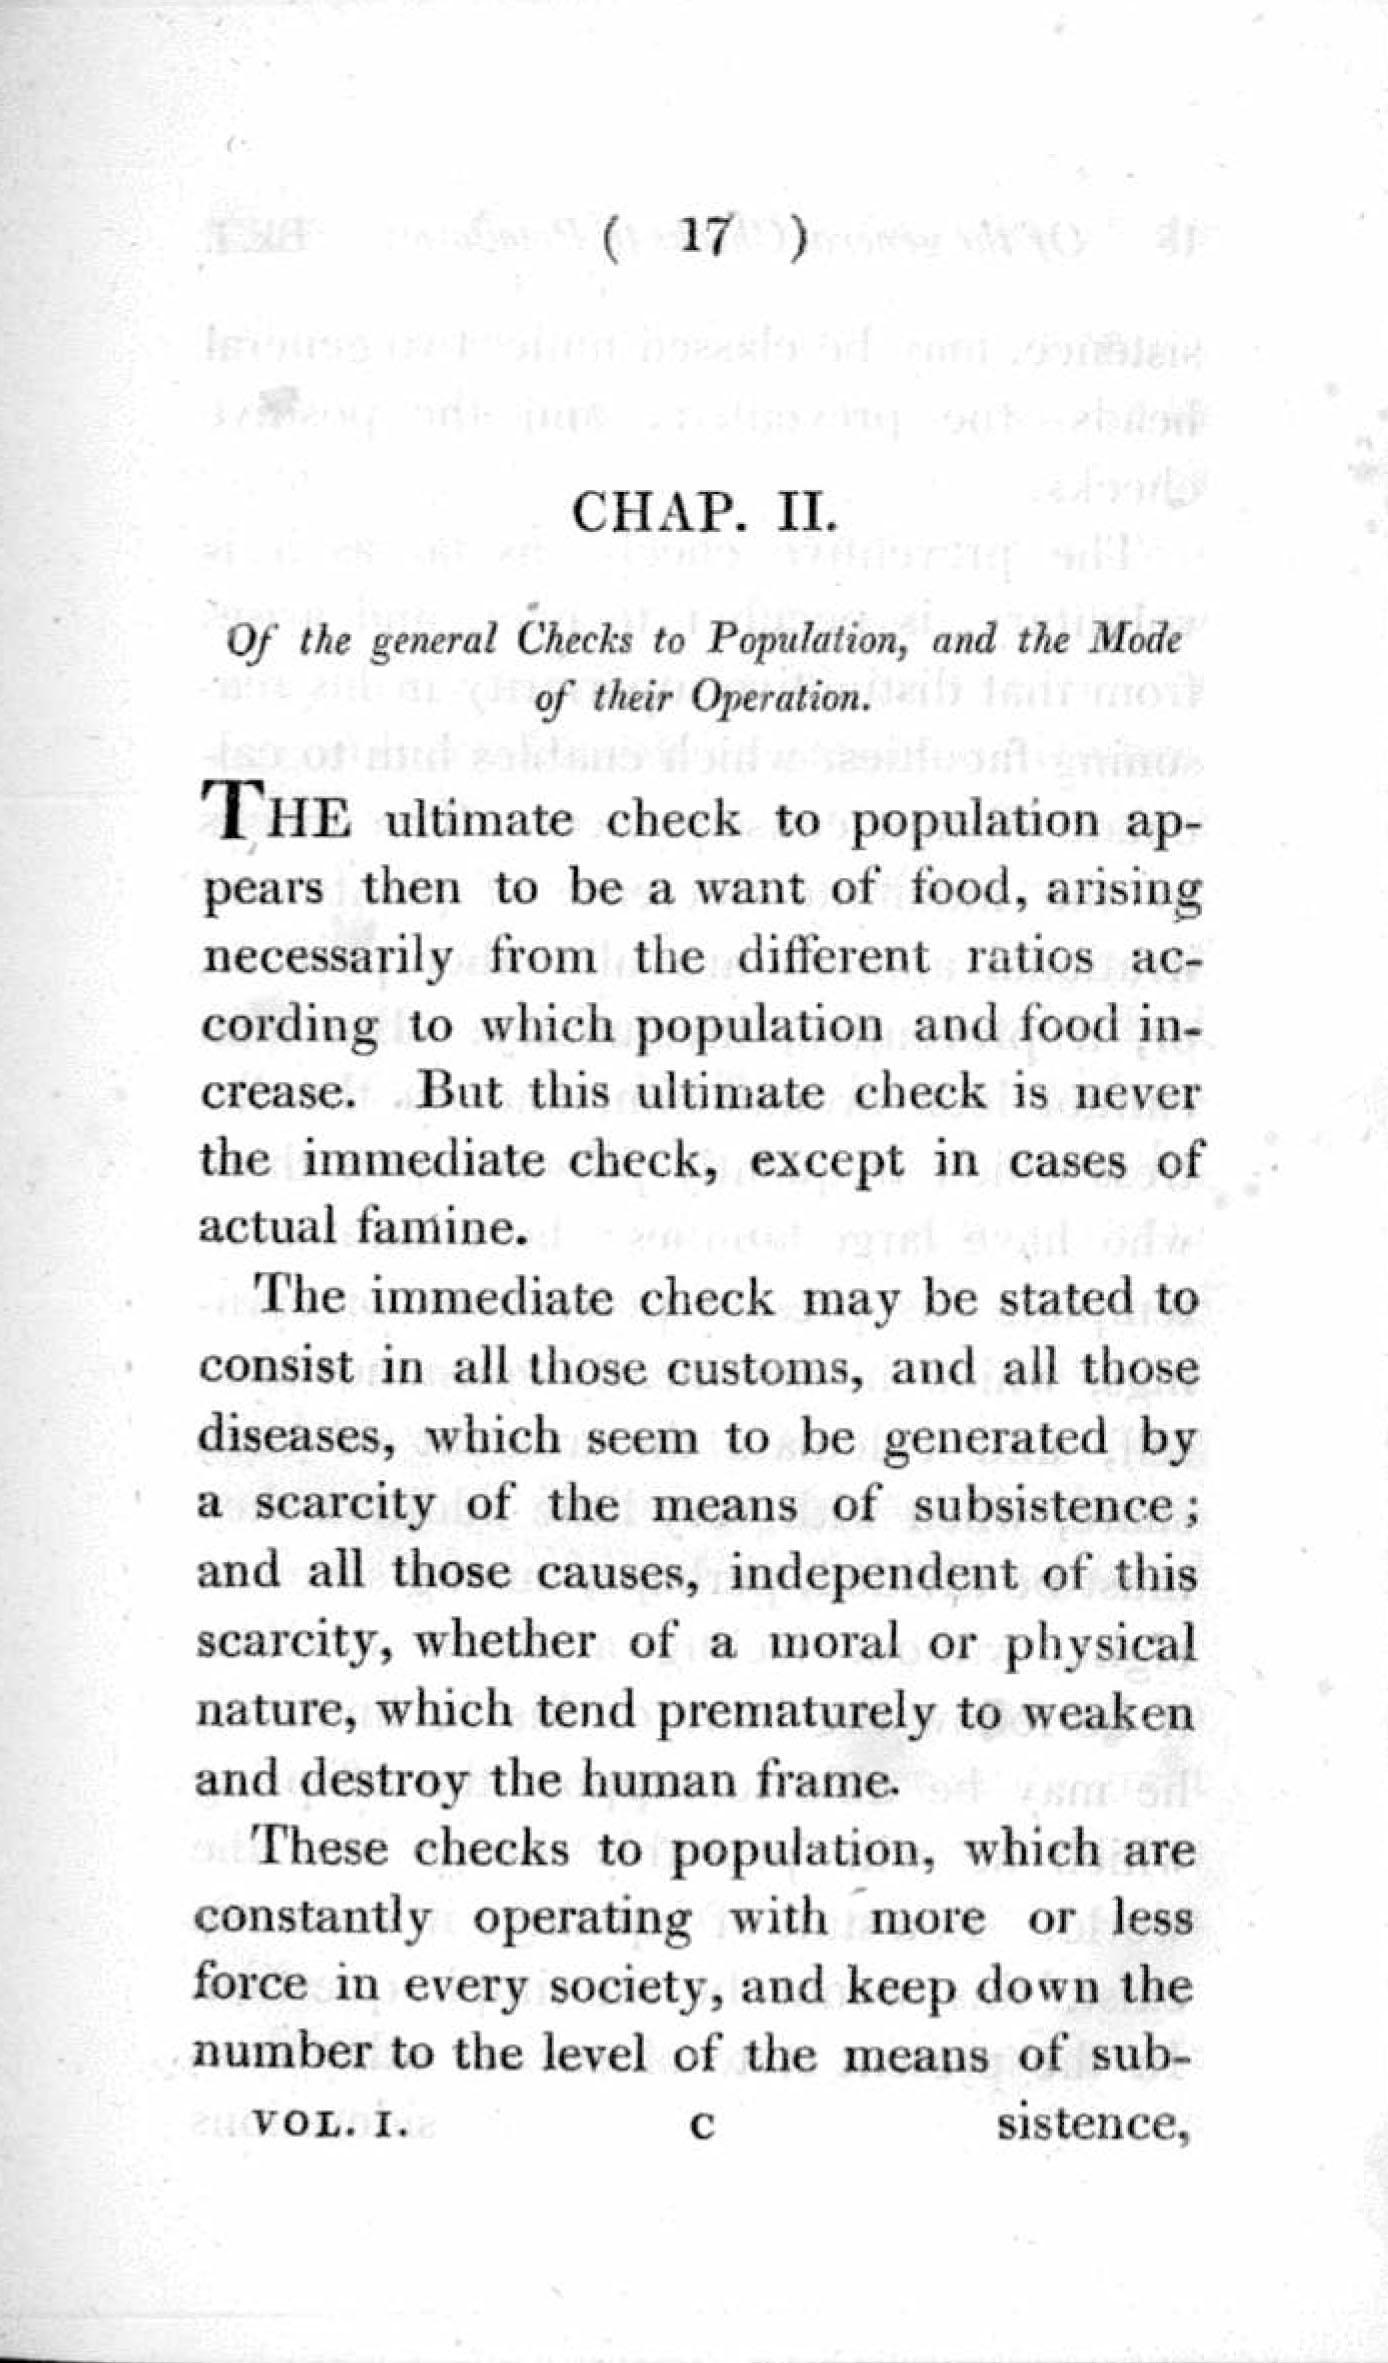 009 Thomas Malthus Essay On The Principle Of Population Stupendous After Reading Malthus's Principles Darwin Got Idea That Ap Euro Full